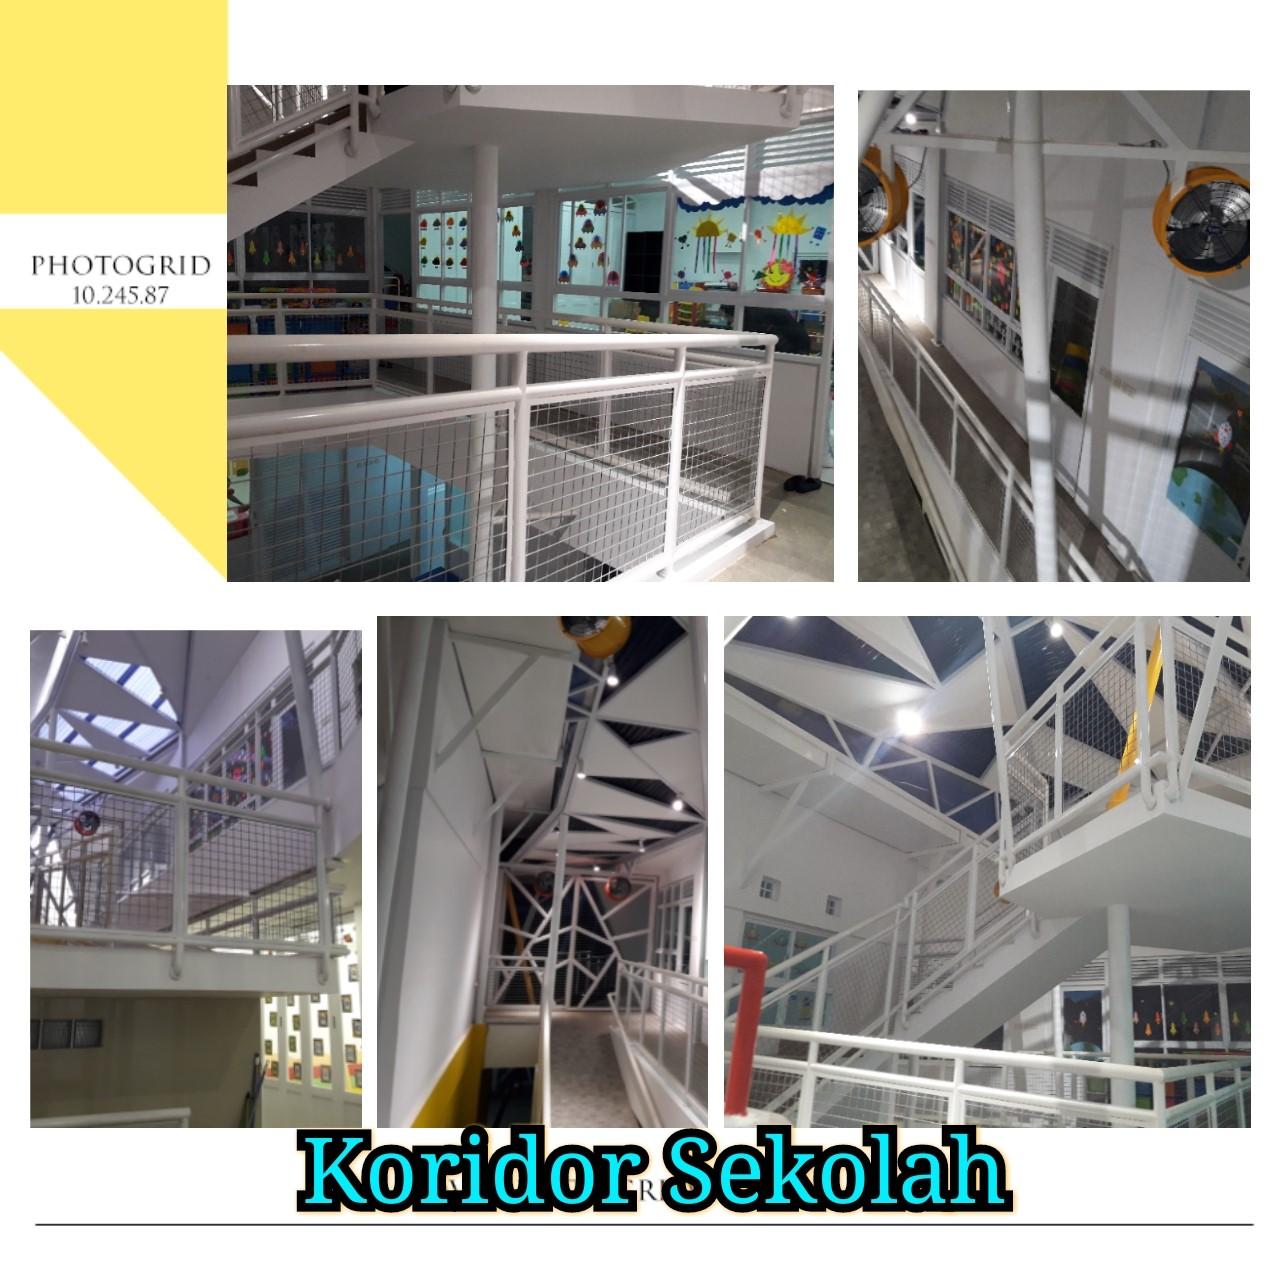 Koridor Sekolah